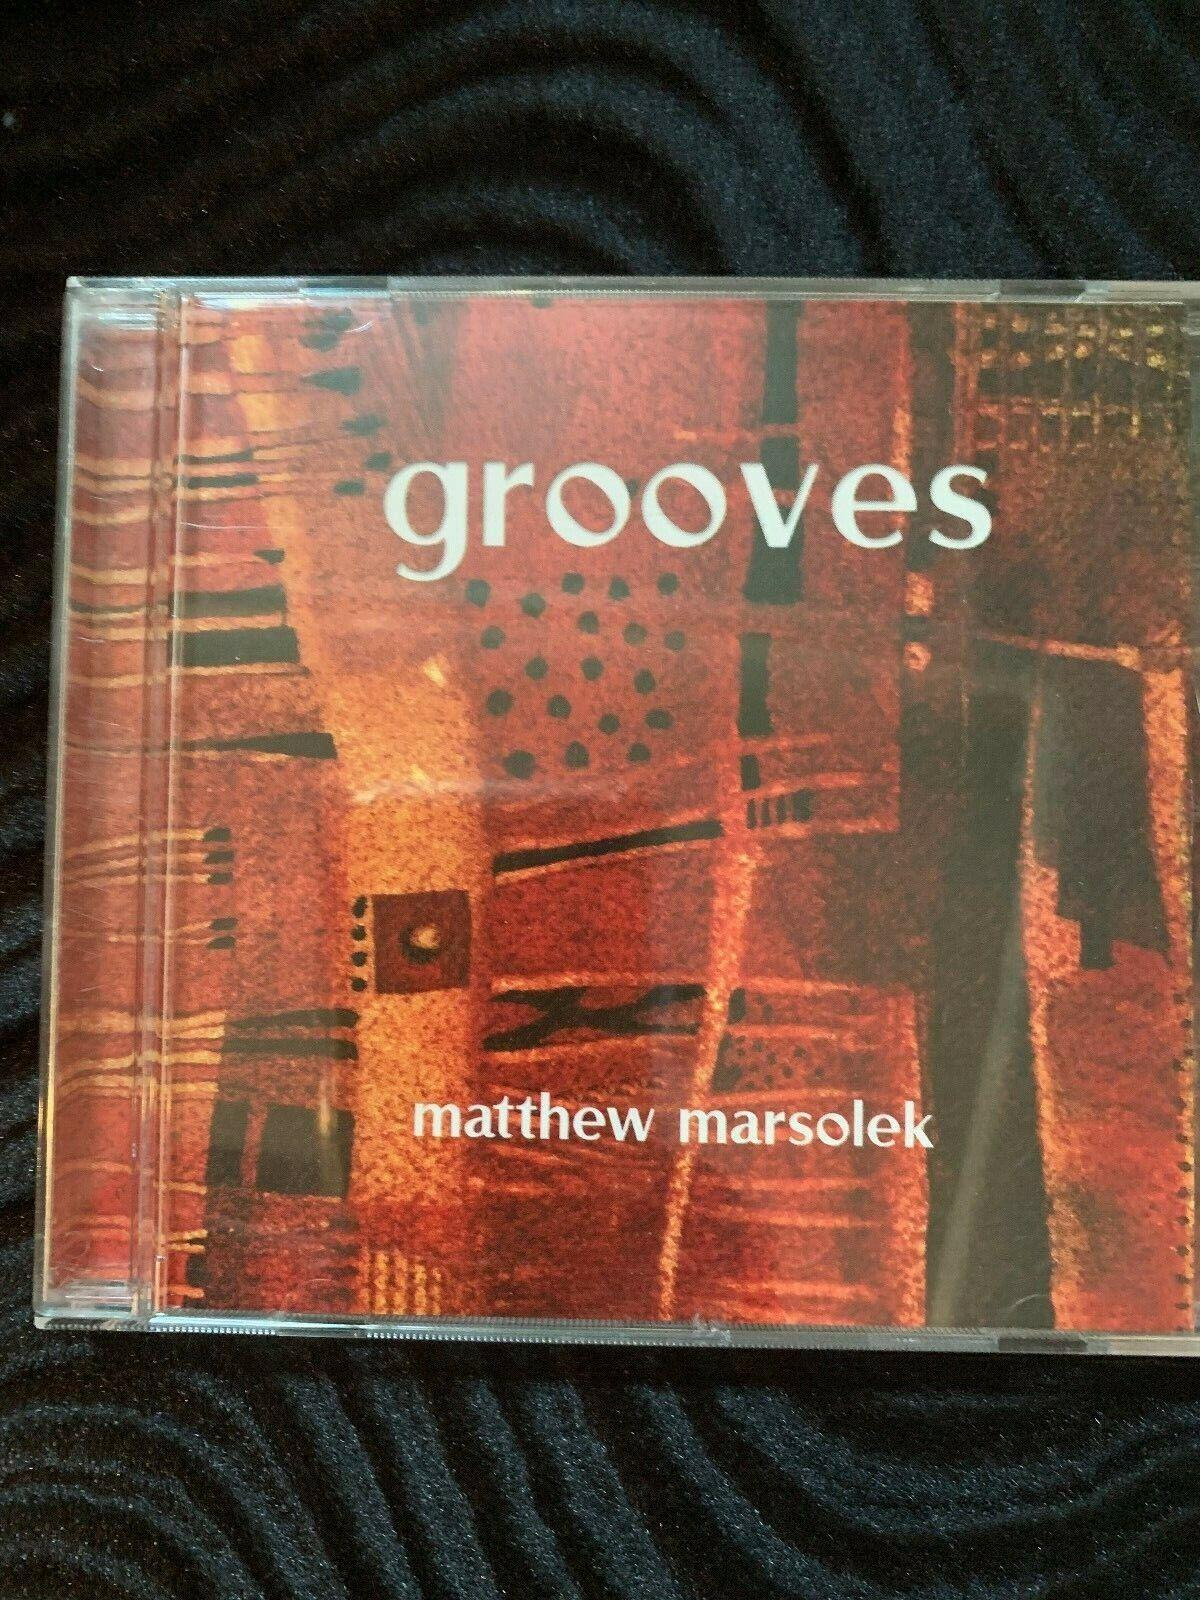 Matthew Marsolek - Grooves - CD - $7.95